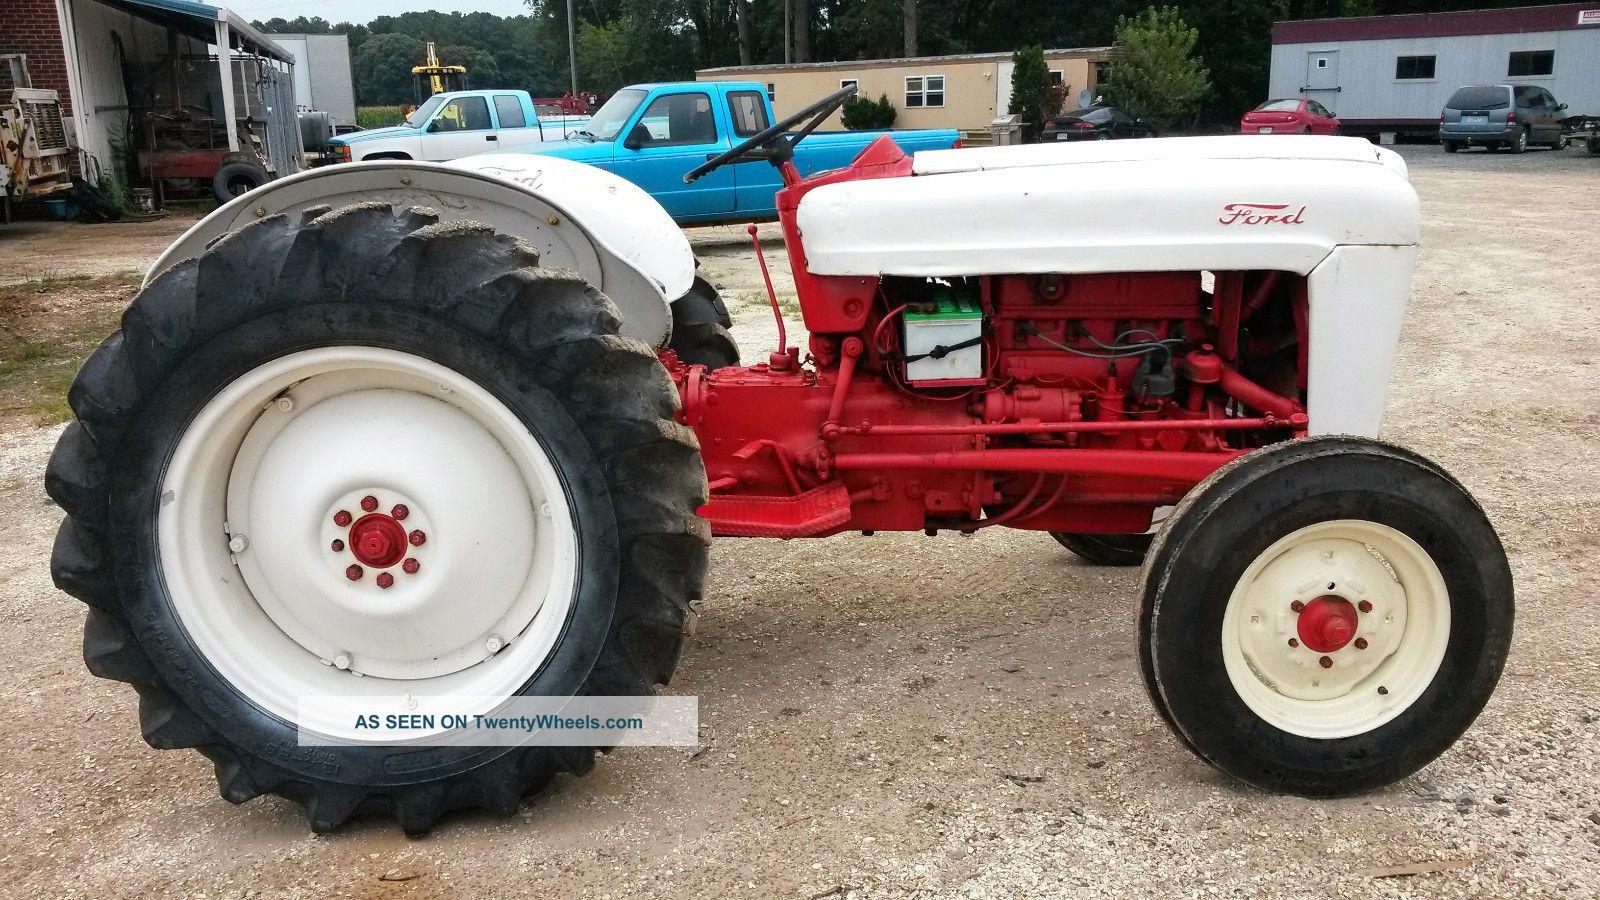 Ford Jubilee Tractor Wheels : Ford jubilee tractor specs